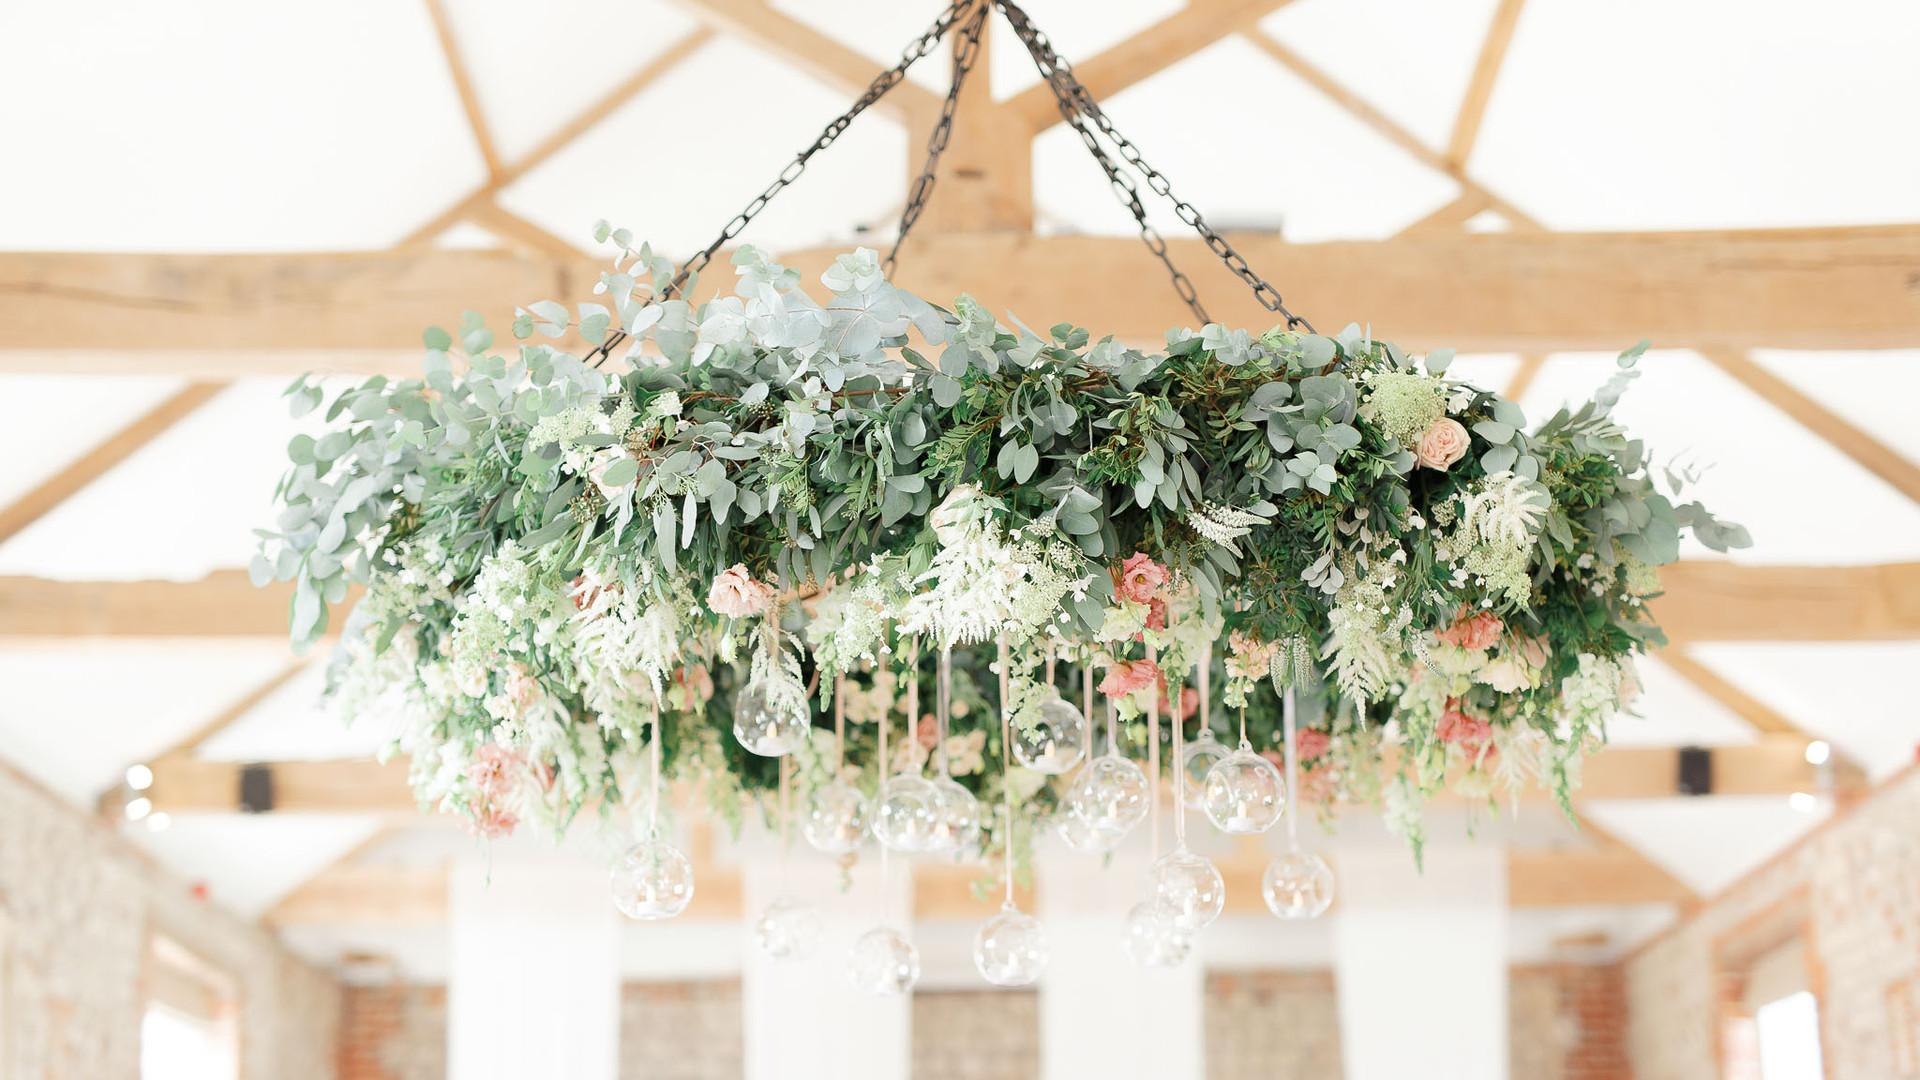 The Floral Artisan - Floral Wedding Centrepiece